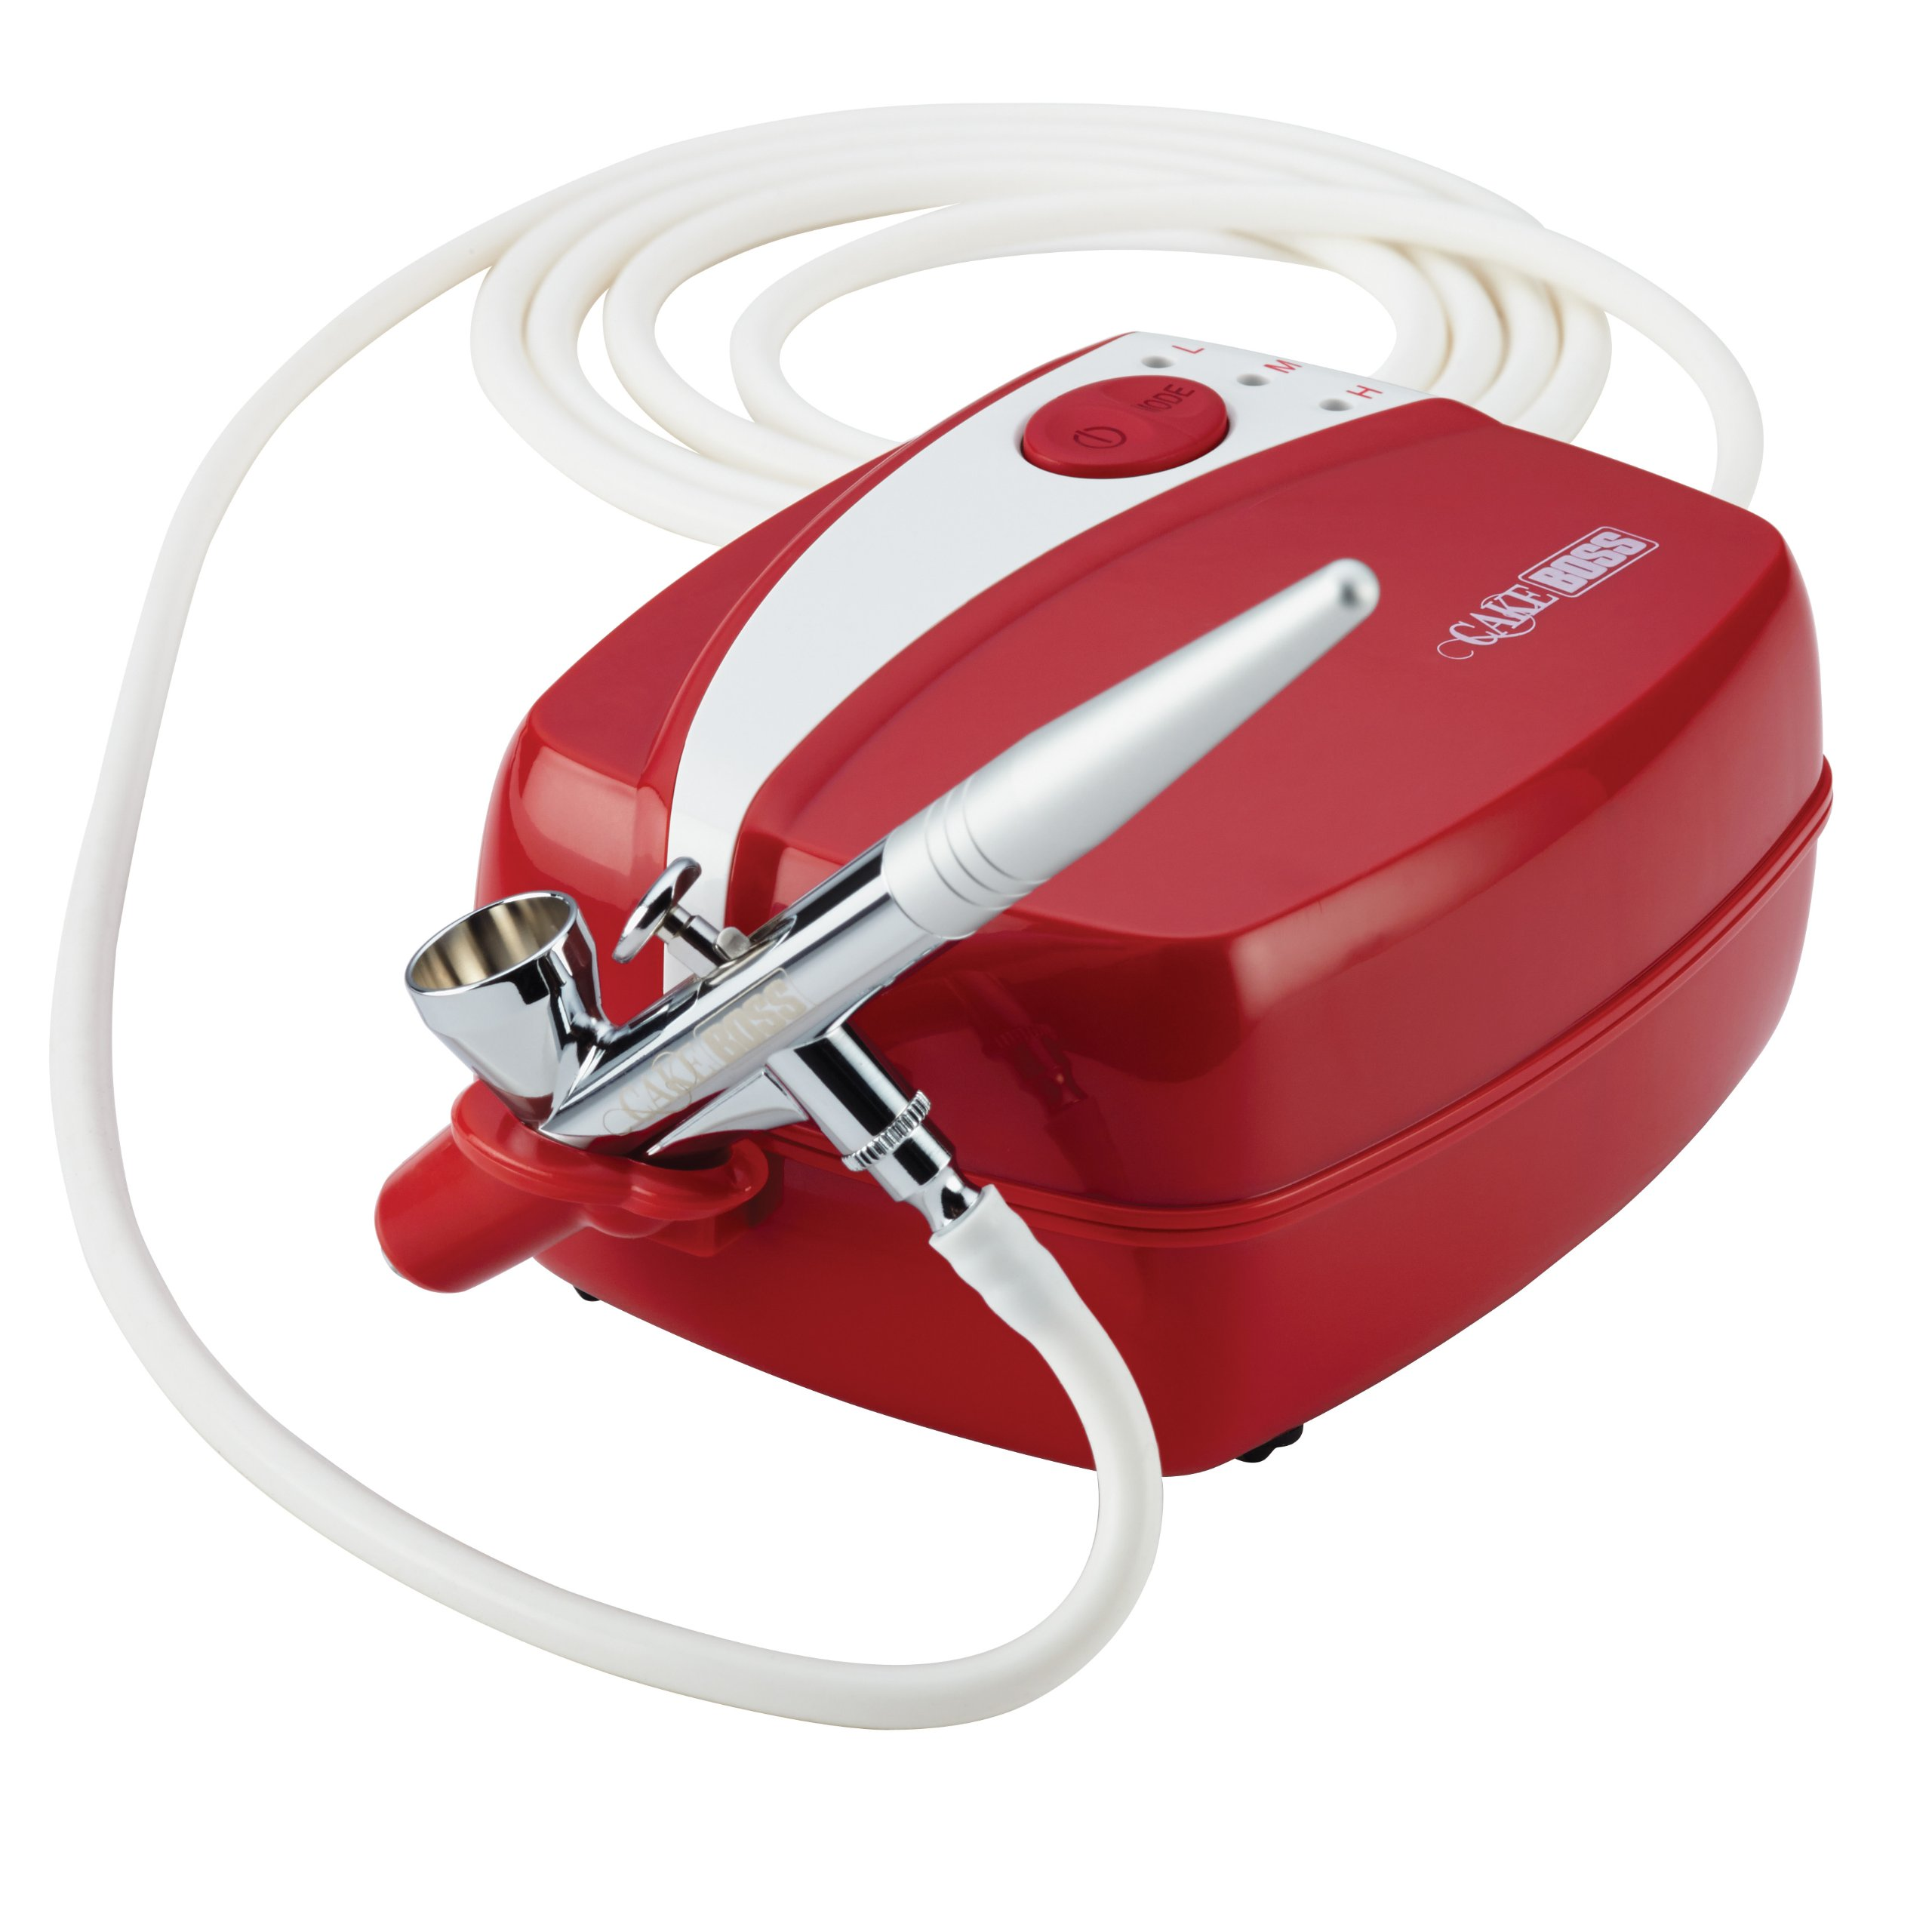 Cake Boss 50660 Decorating Tools Air Brush Kit, Red by Cake Boss